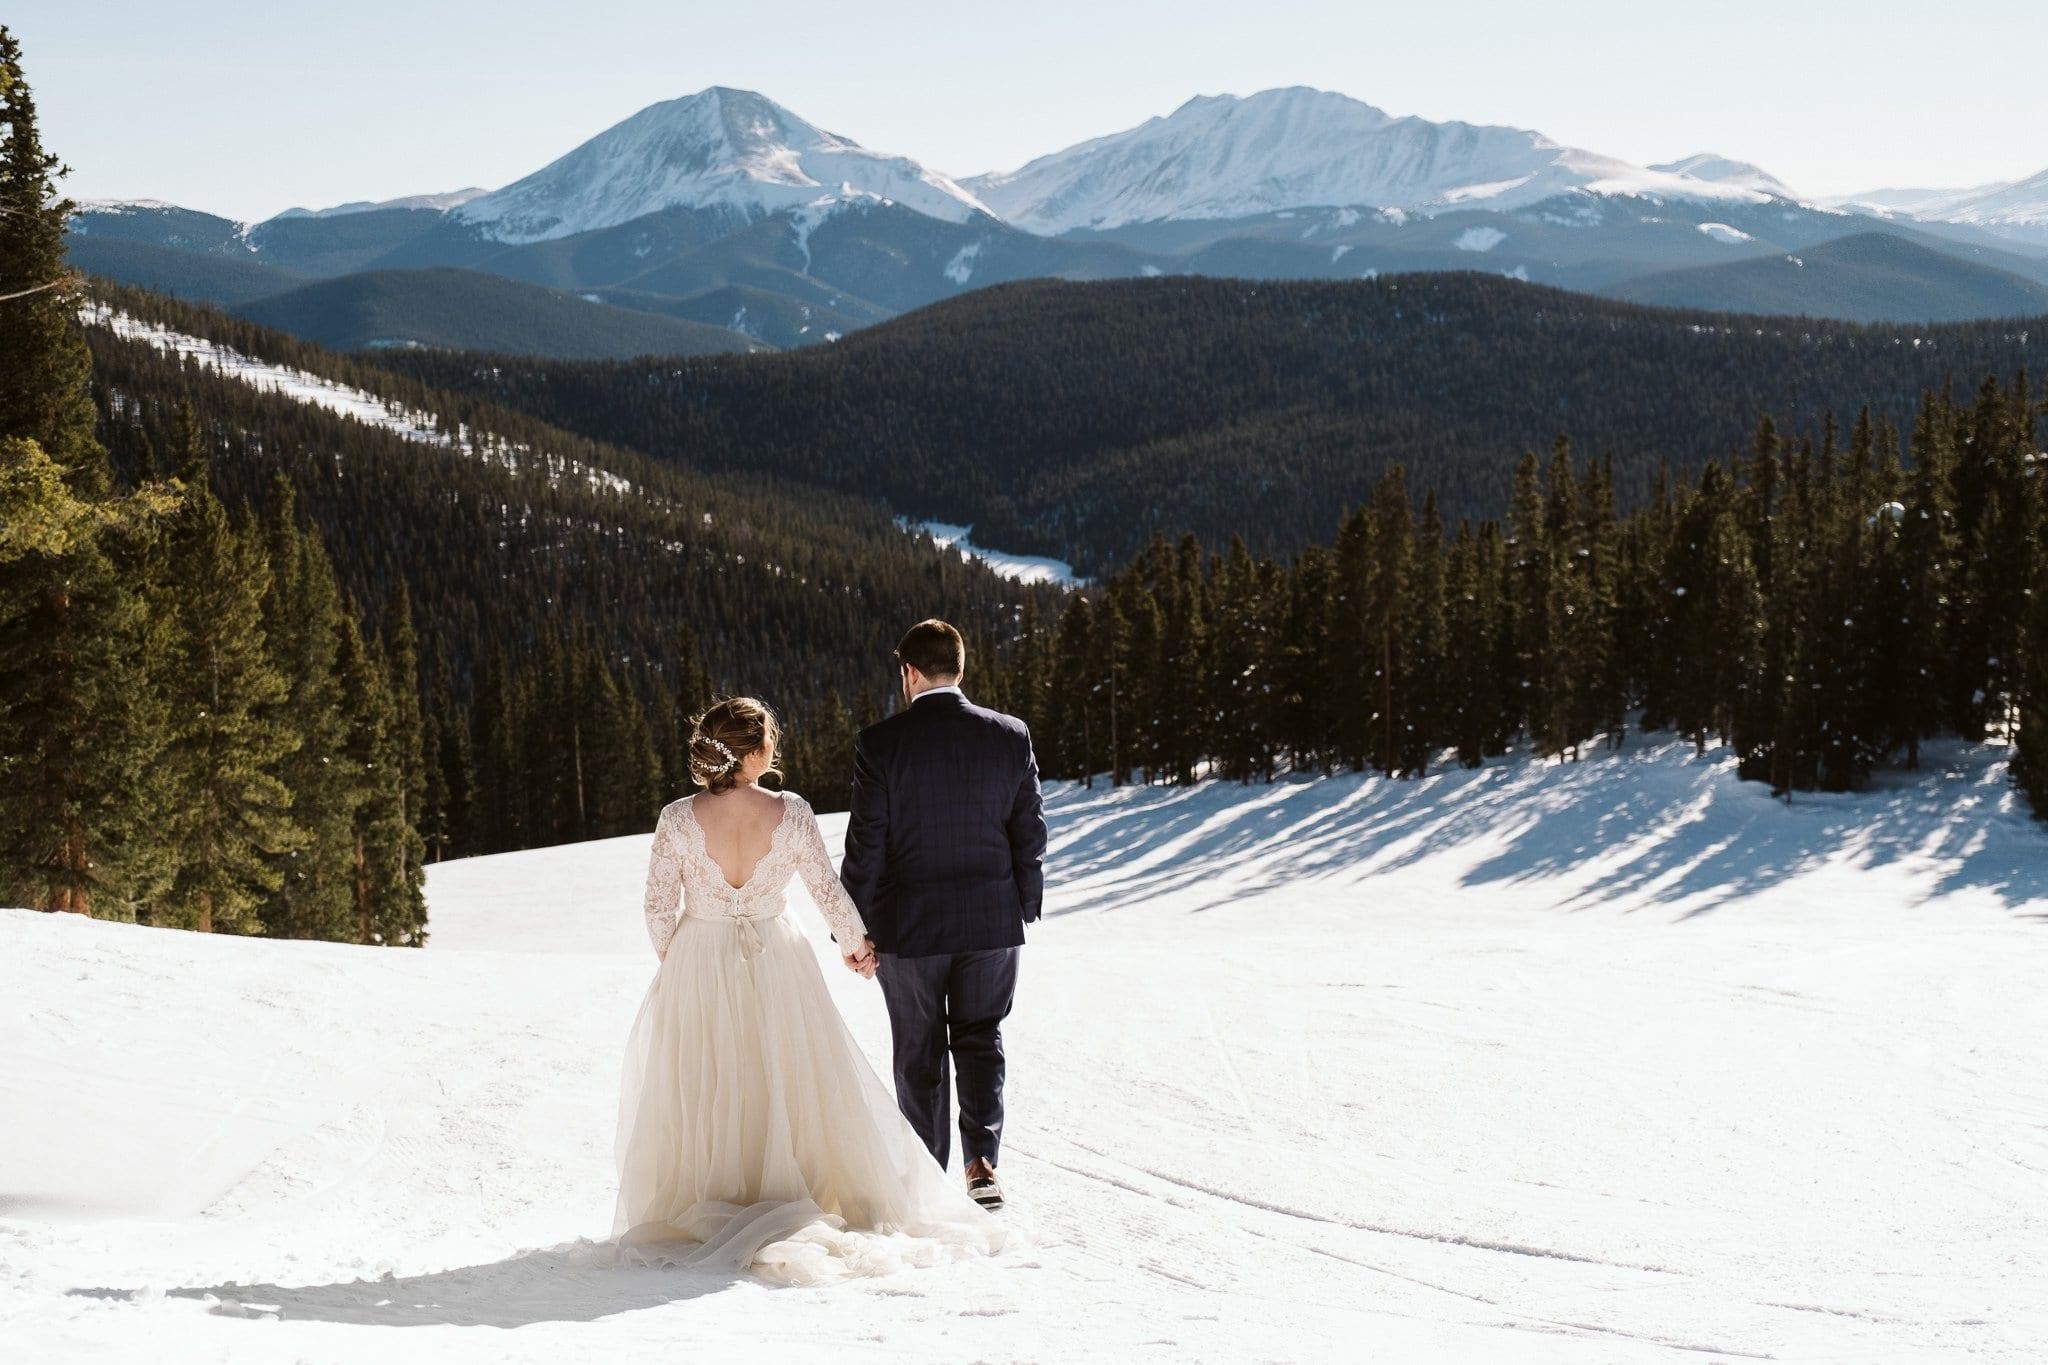 Bride and groom on the ski slopes at Keystone in Colroado.